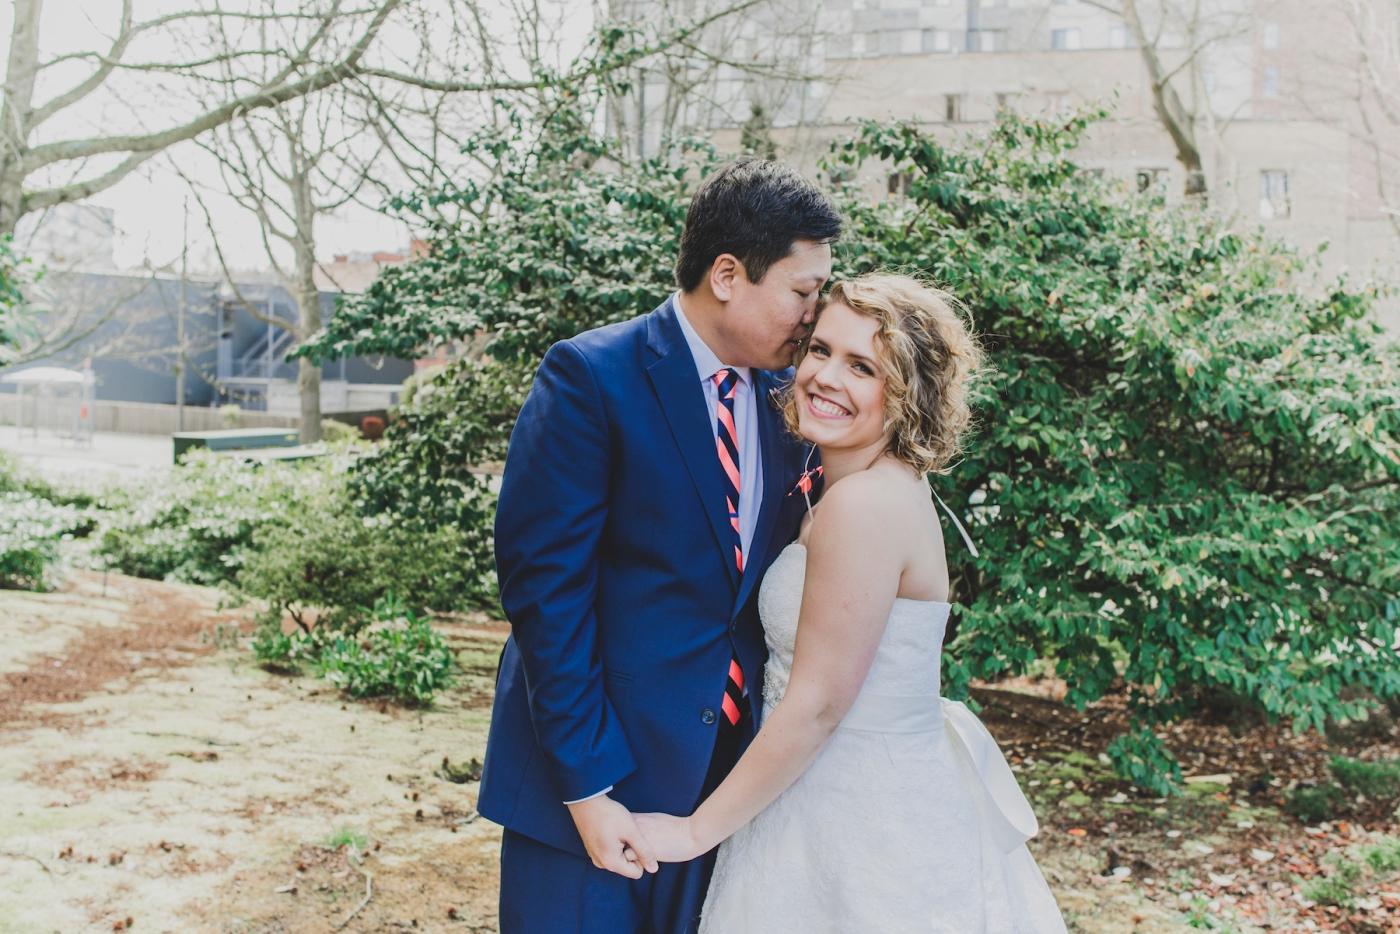 DSC_2330Everett_Wedding_Ballroom_Jane_Speleers_photography_Rachel_and_Edmund_Bridesmaids_peach_dresses_groomsmen_2017